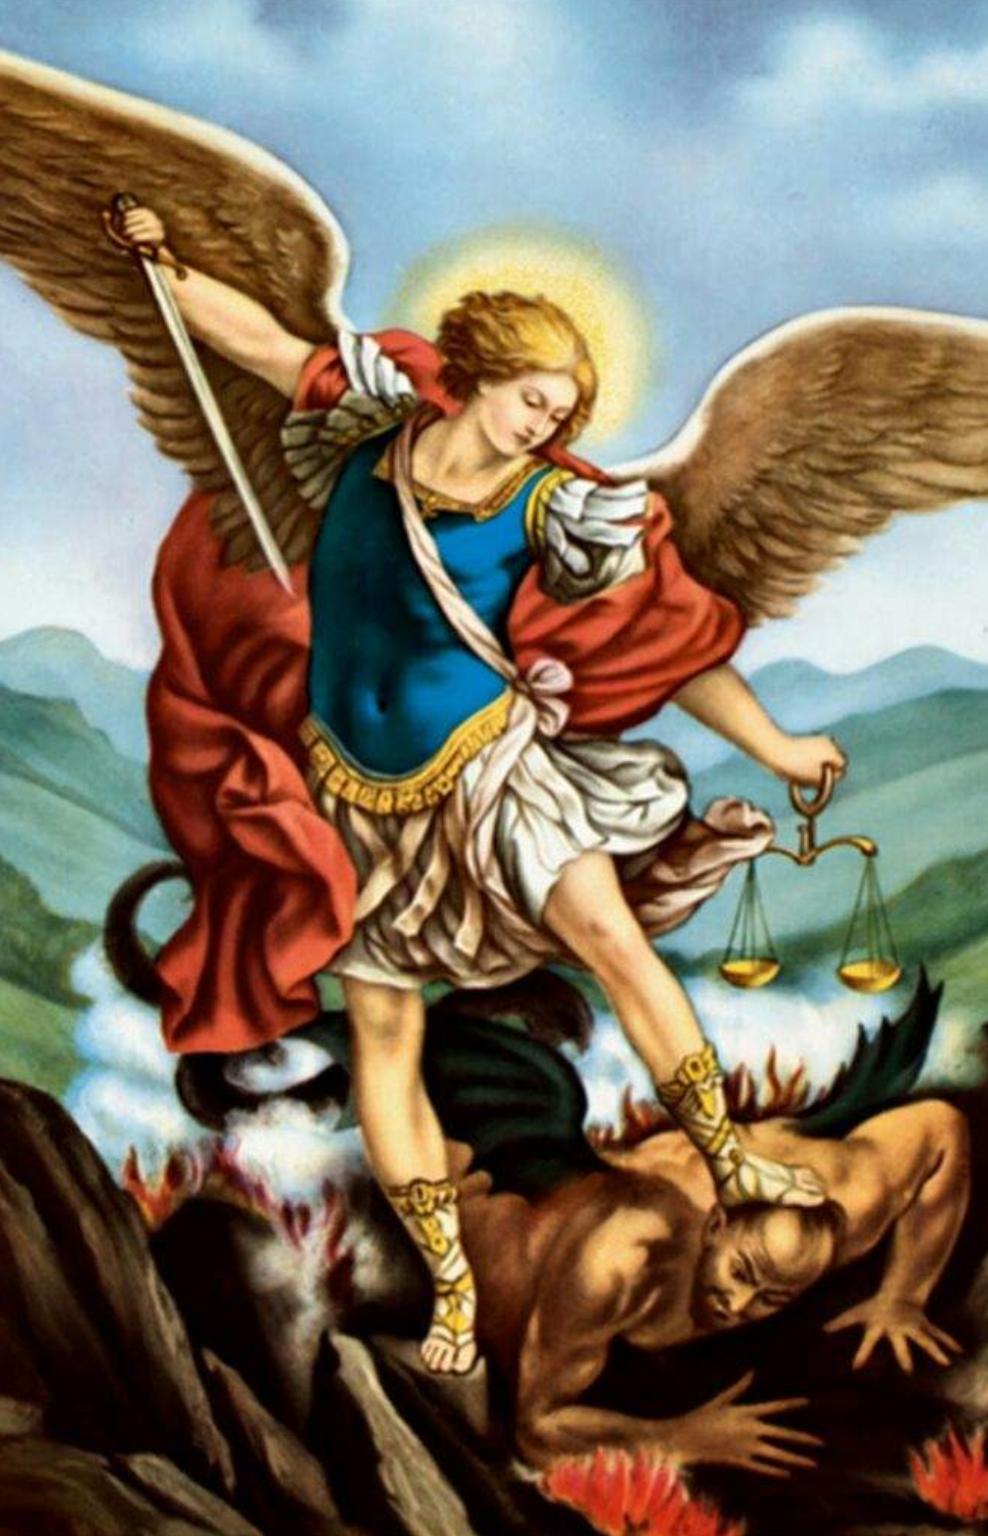 Messenger - Archangel Michael: The Protector